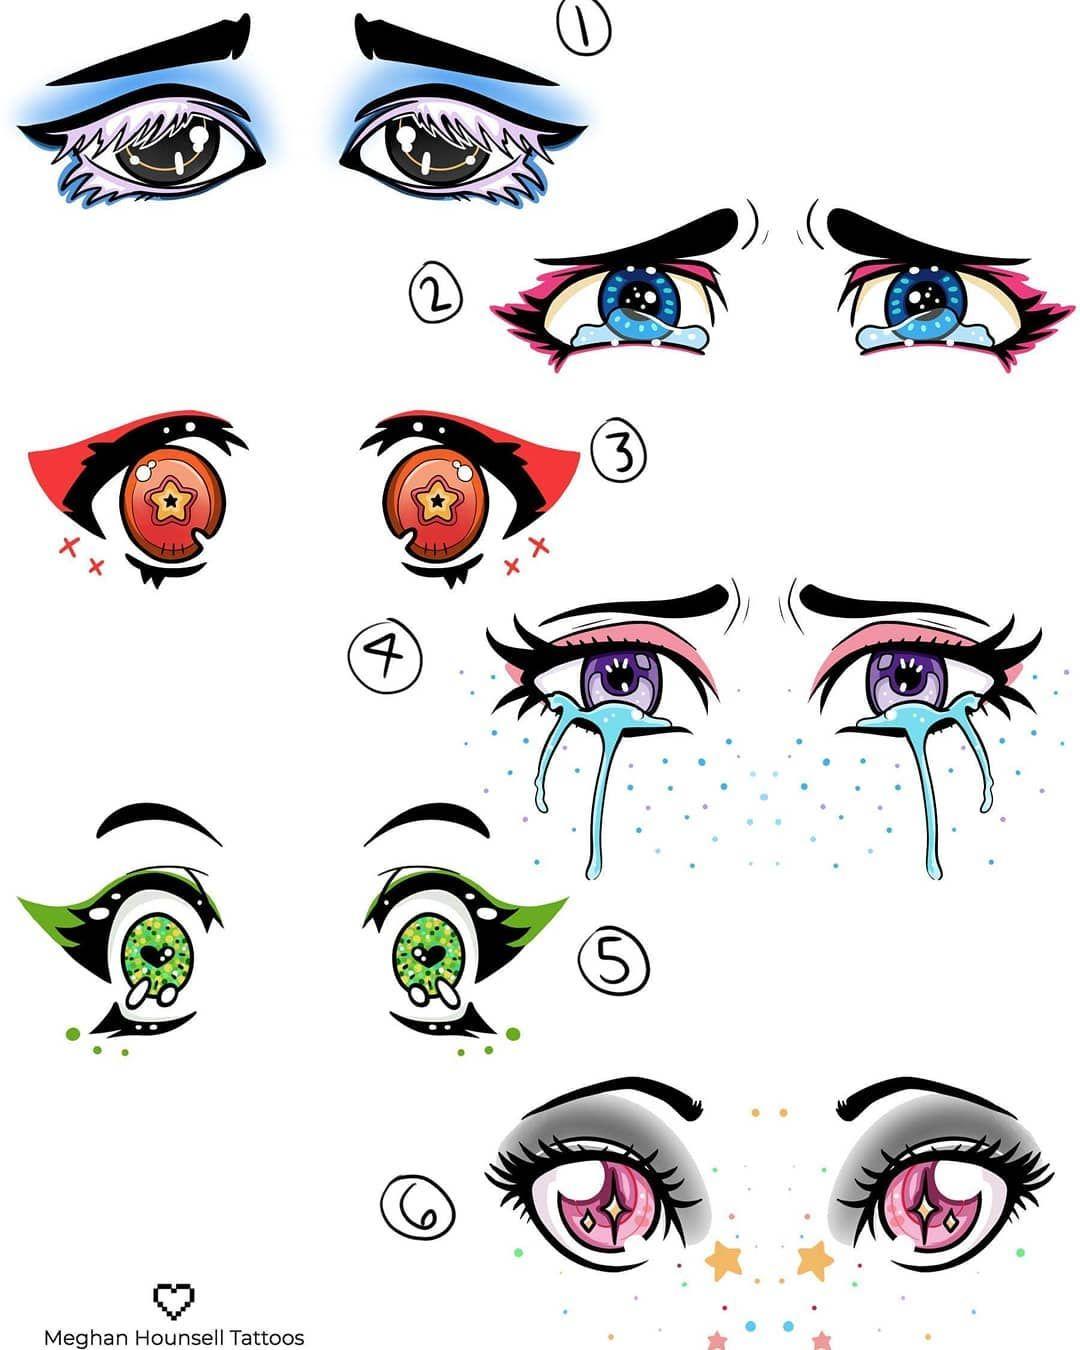 ** 300 FLAT!! ** First set of anime eyes! #tattoo #tattooartist #anime #animetattoo #manga #mangatattoo #kawaiitattoo #kawaii #animeeye #animeeyes #animeeyestattoo #eyetattoo #upforgrabscalgary #upforgrabs #flash #tattooflash #colourtattoo #colortattoo #cutetattoo #cartoontattoo #calgary #calgarytattoos #calgarytattooartists #calgarytattooartist #yyc #yyctattooartists #yyctattooartist #piratesloot #piratesloottattoo #skinart #